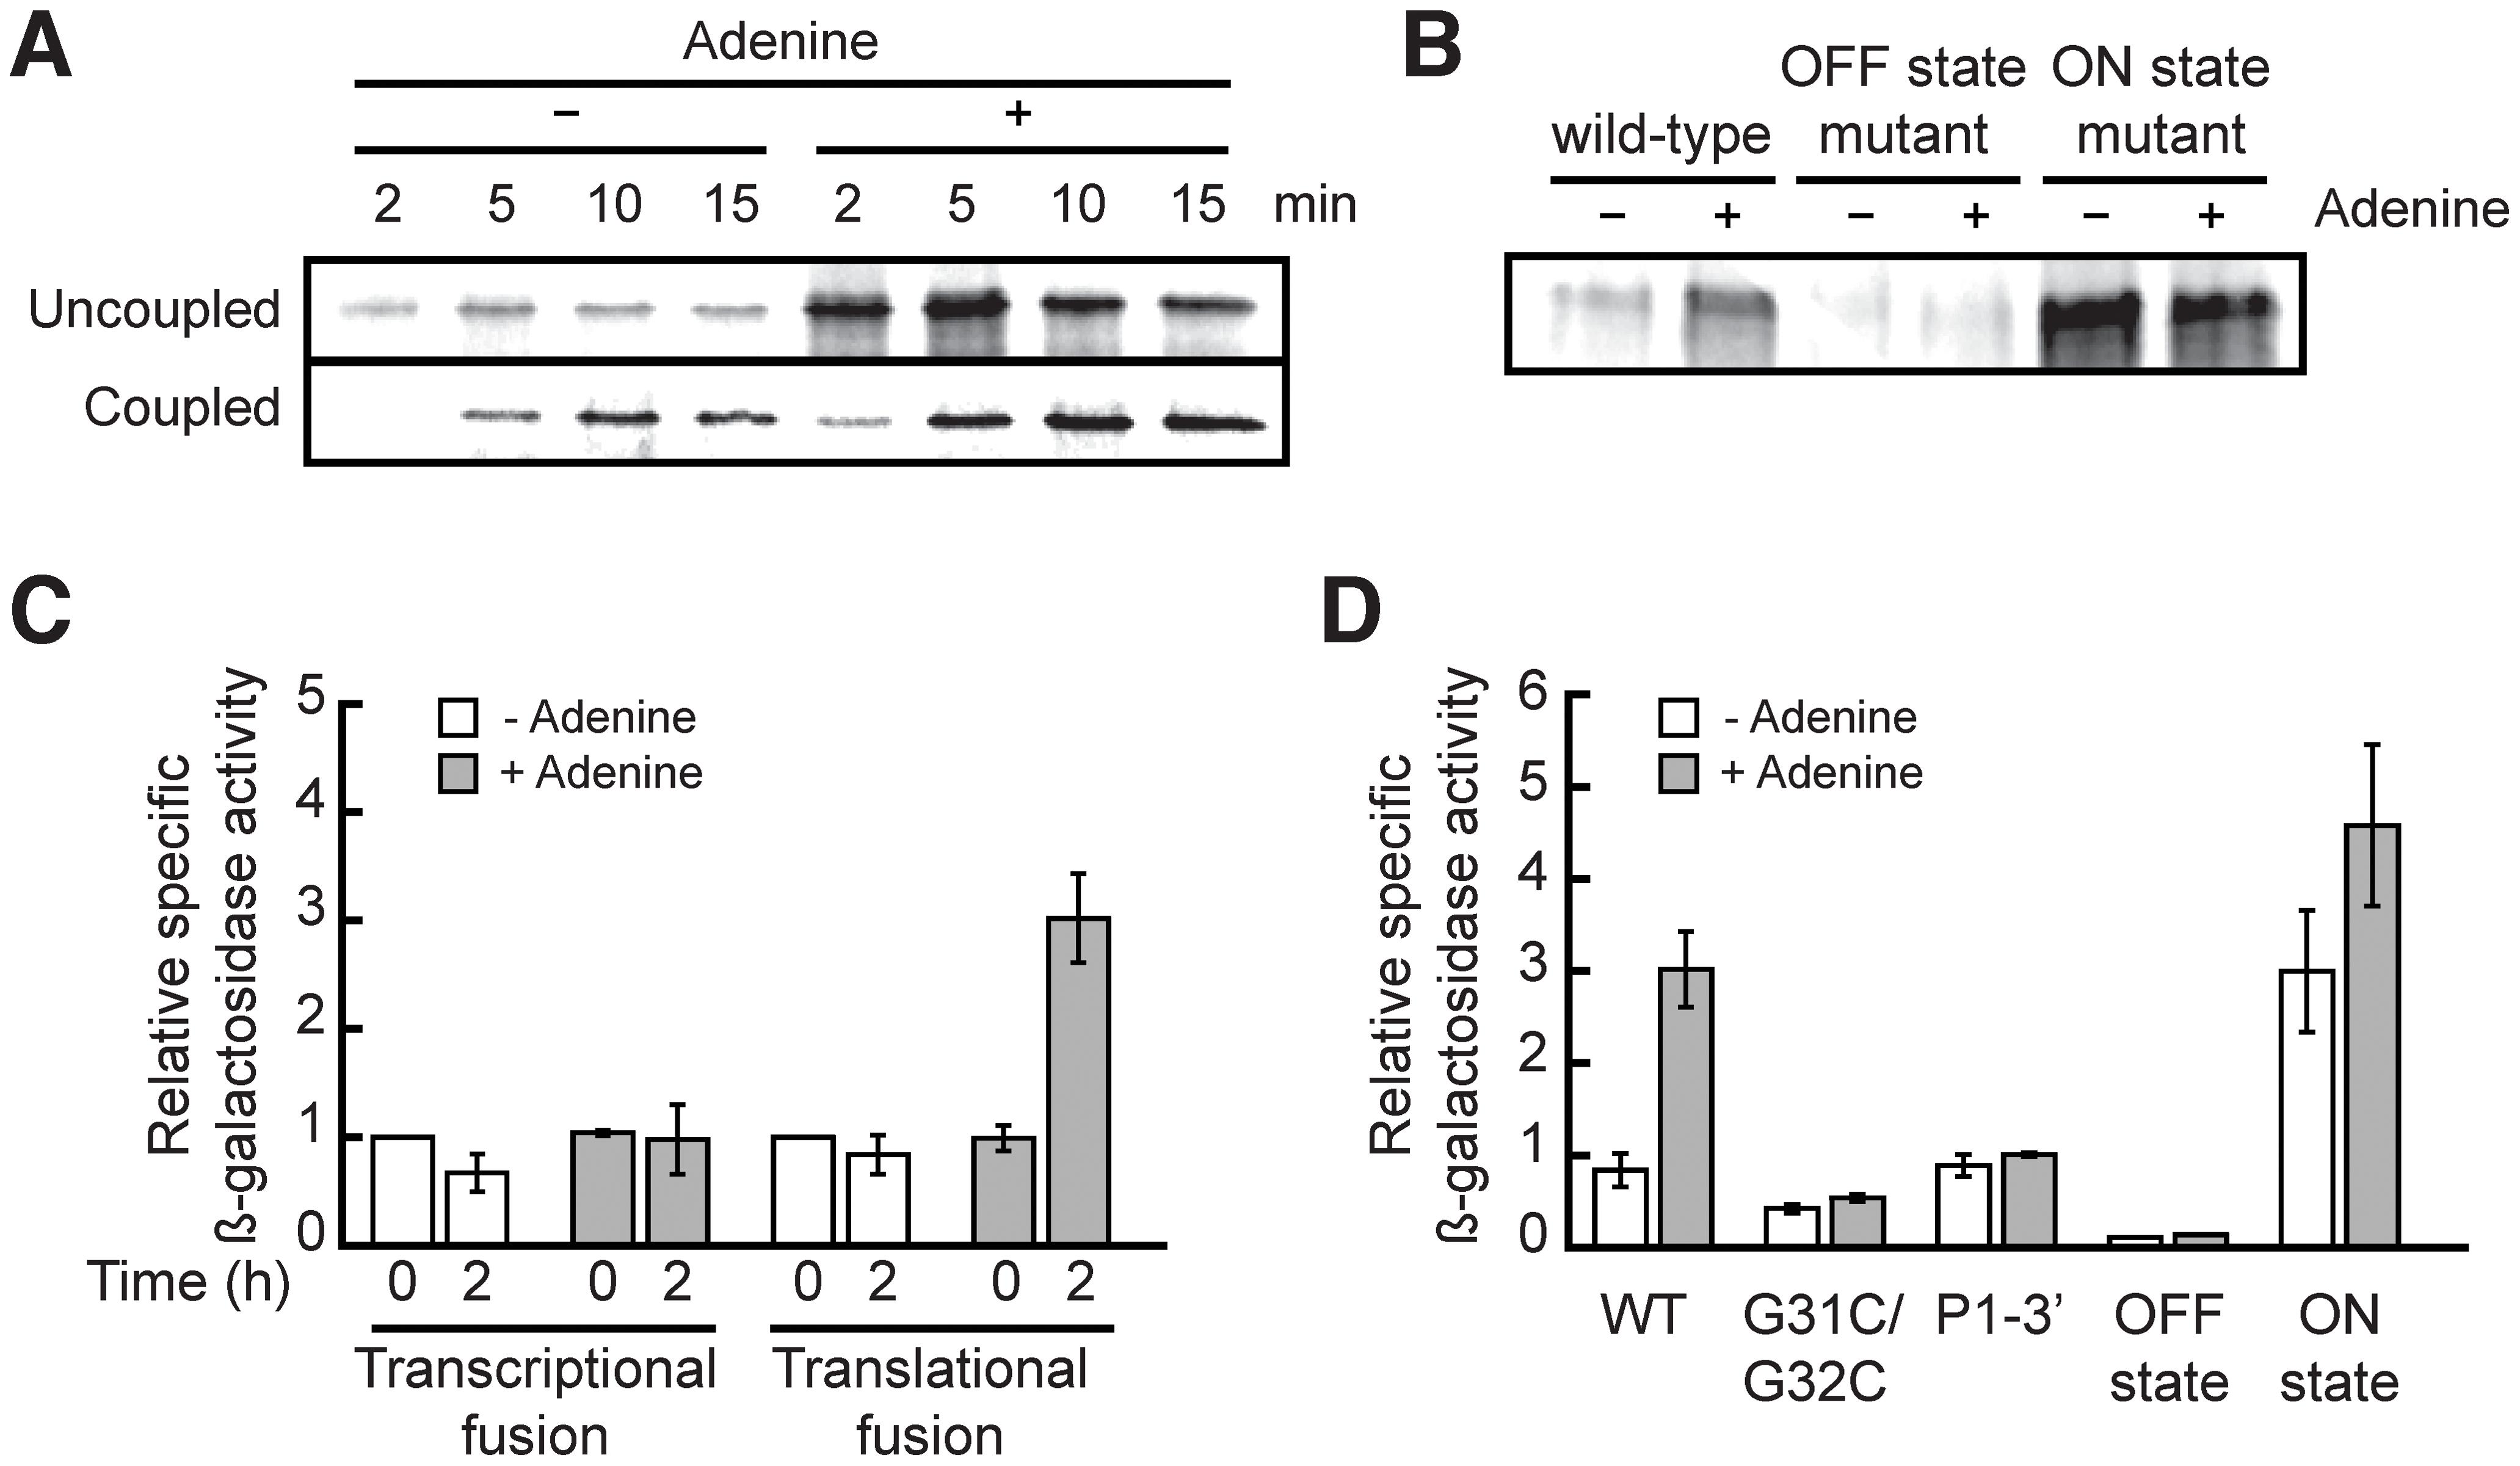 The <i>add</i> riboswitch positively regulates gene expression <i>in vitro</i> and <i>in vivo</i>.